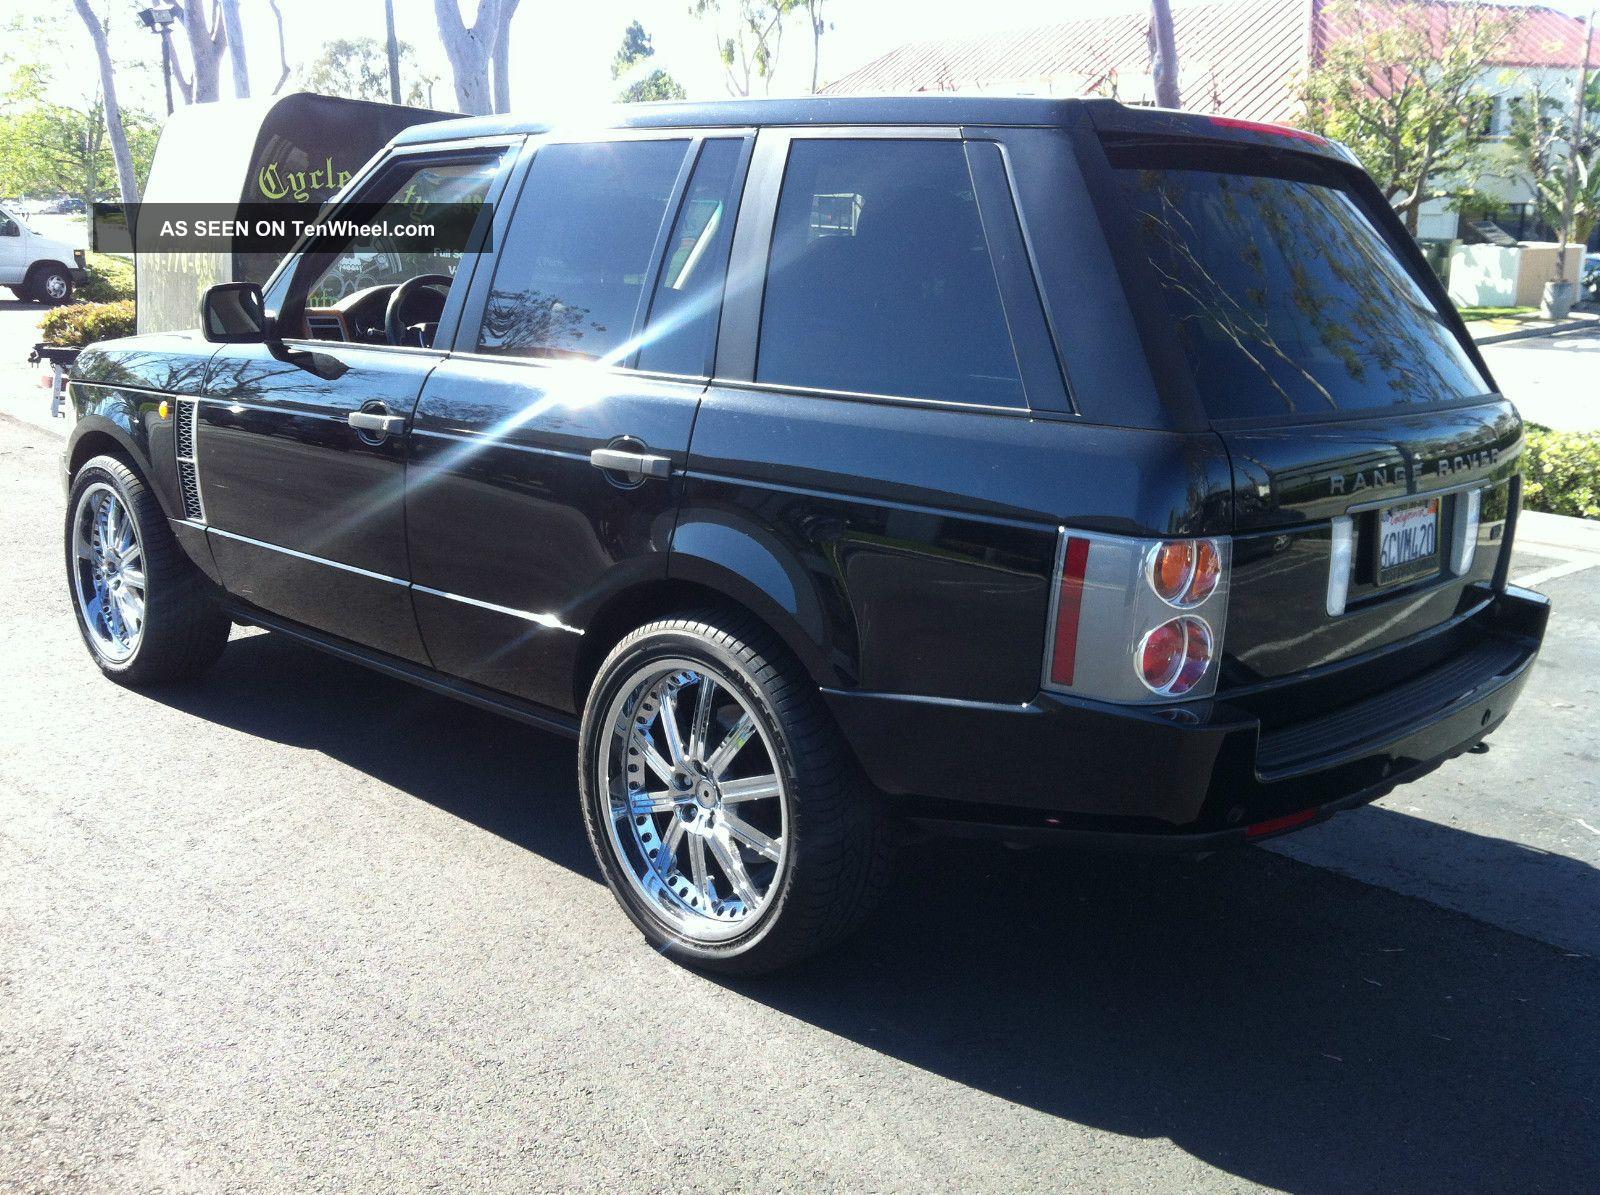 2004 range rover full size hse luxury black on grey 132000mi. Black Bedroom Furniture Sets. Home Design Ideas